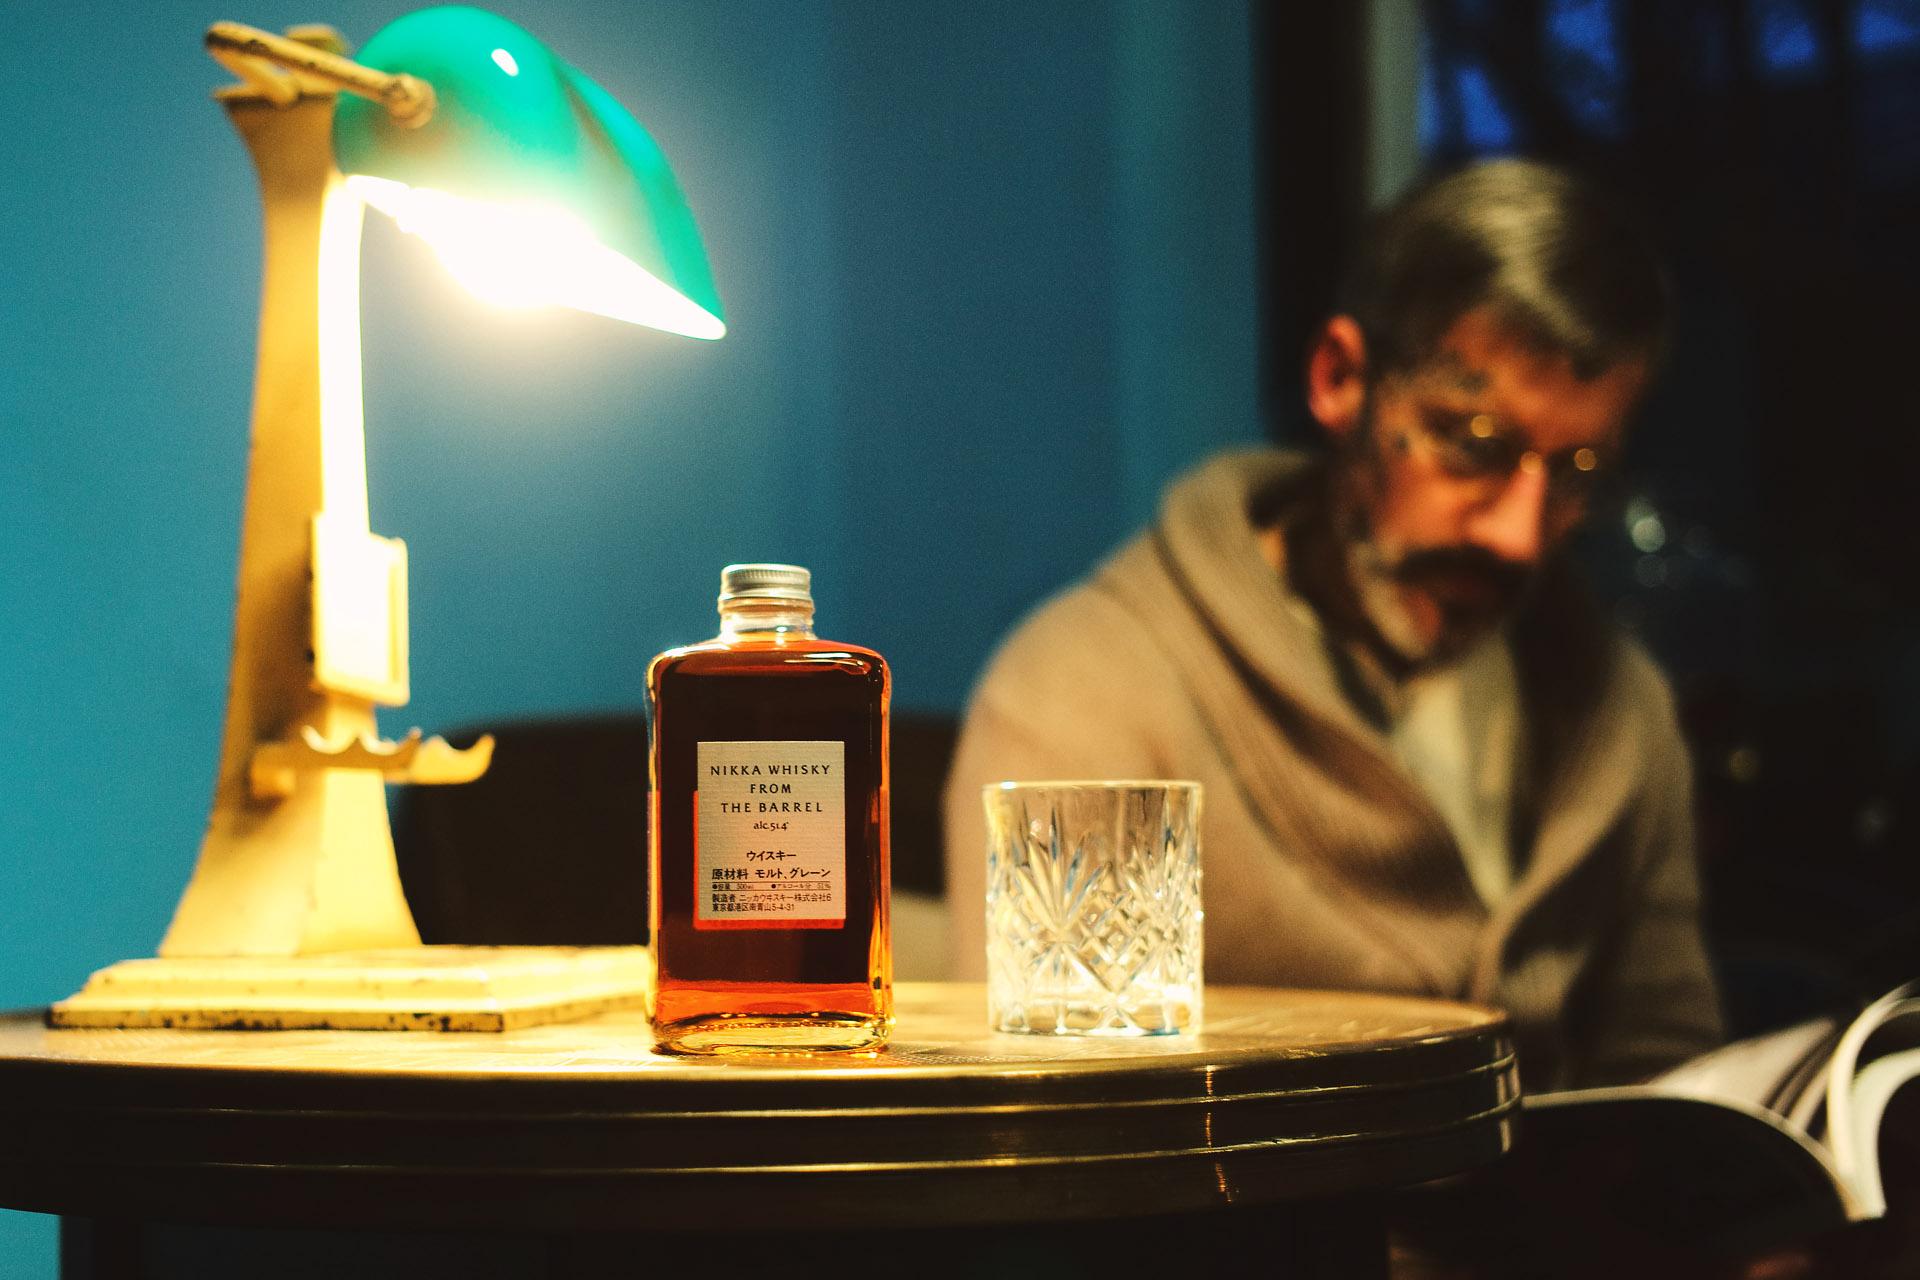 nikka-whiskey-fromthebarrel-japan-geschenkidee-weihnachten